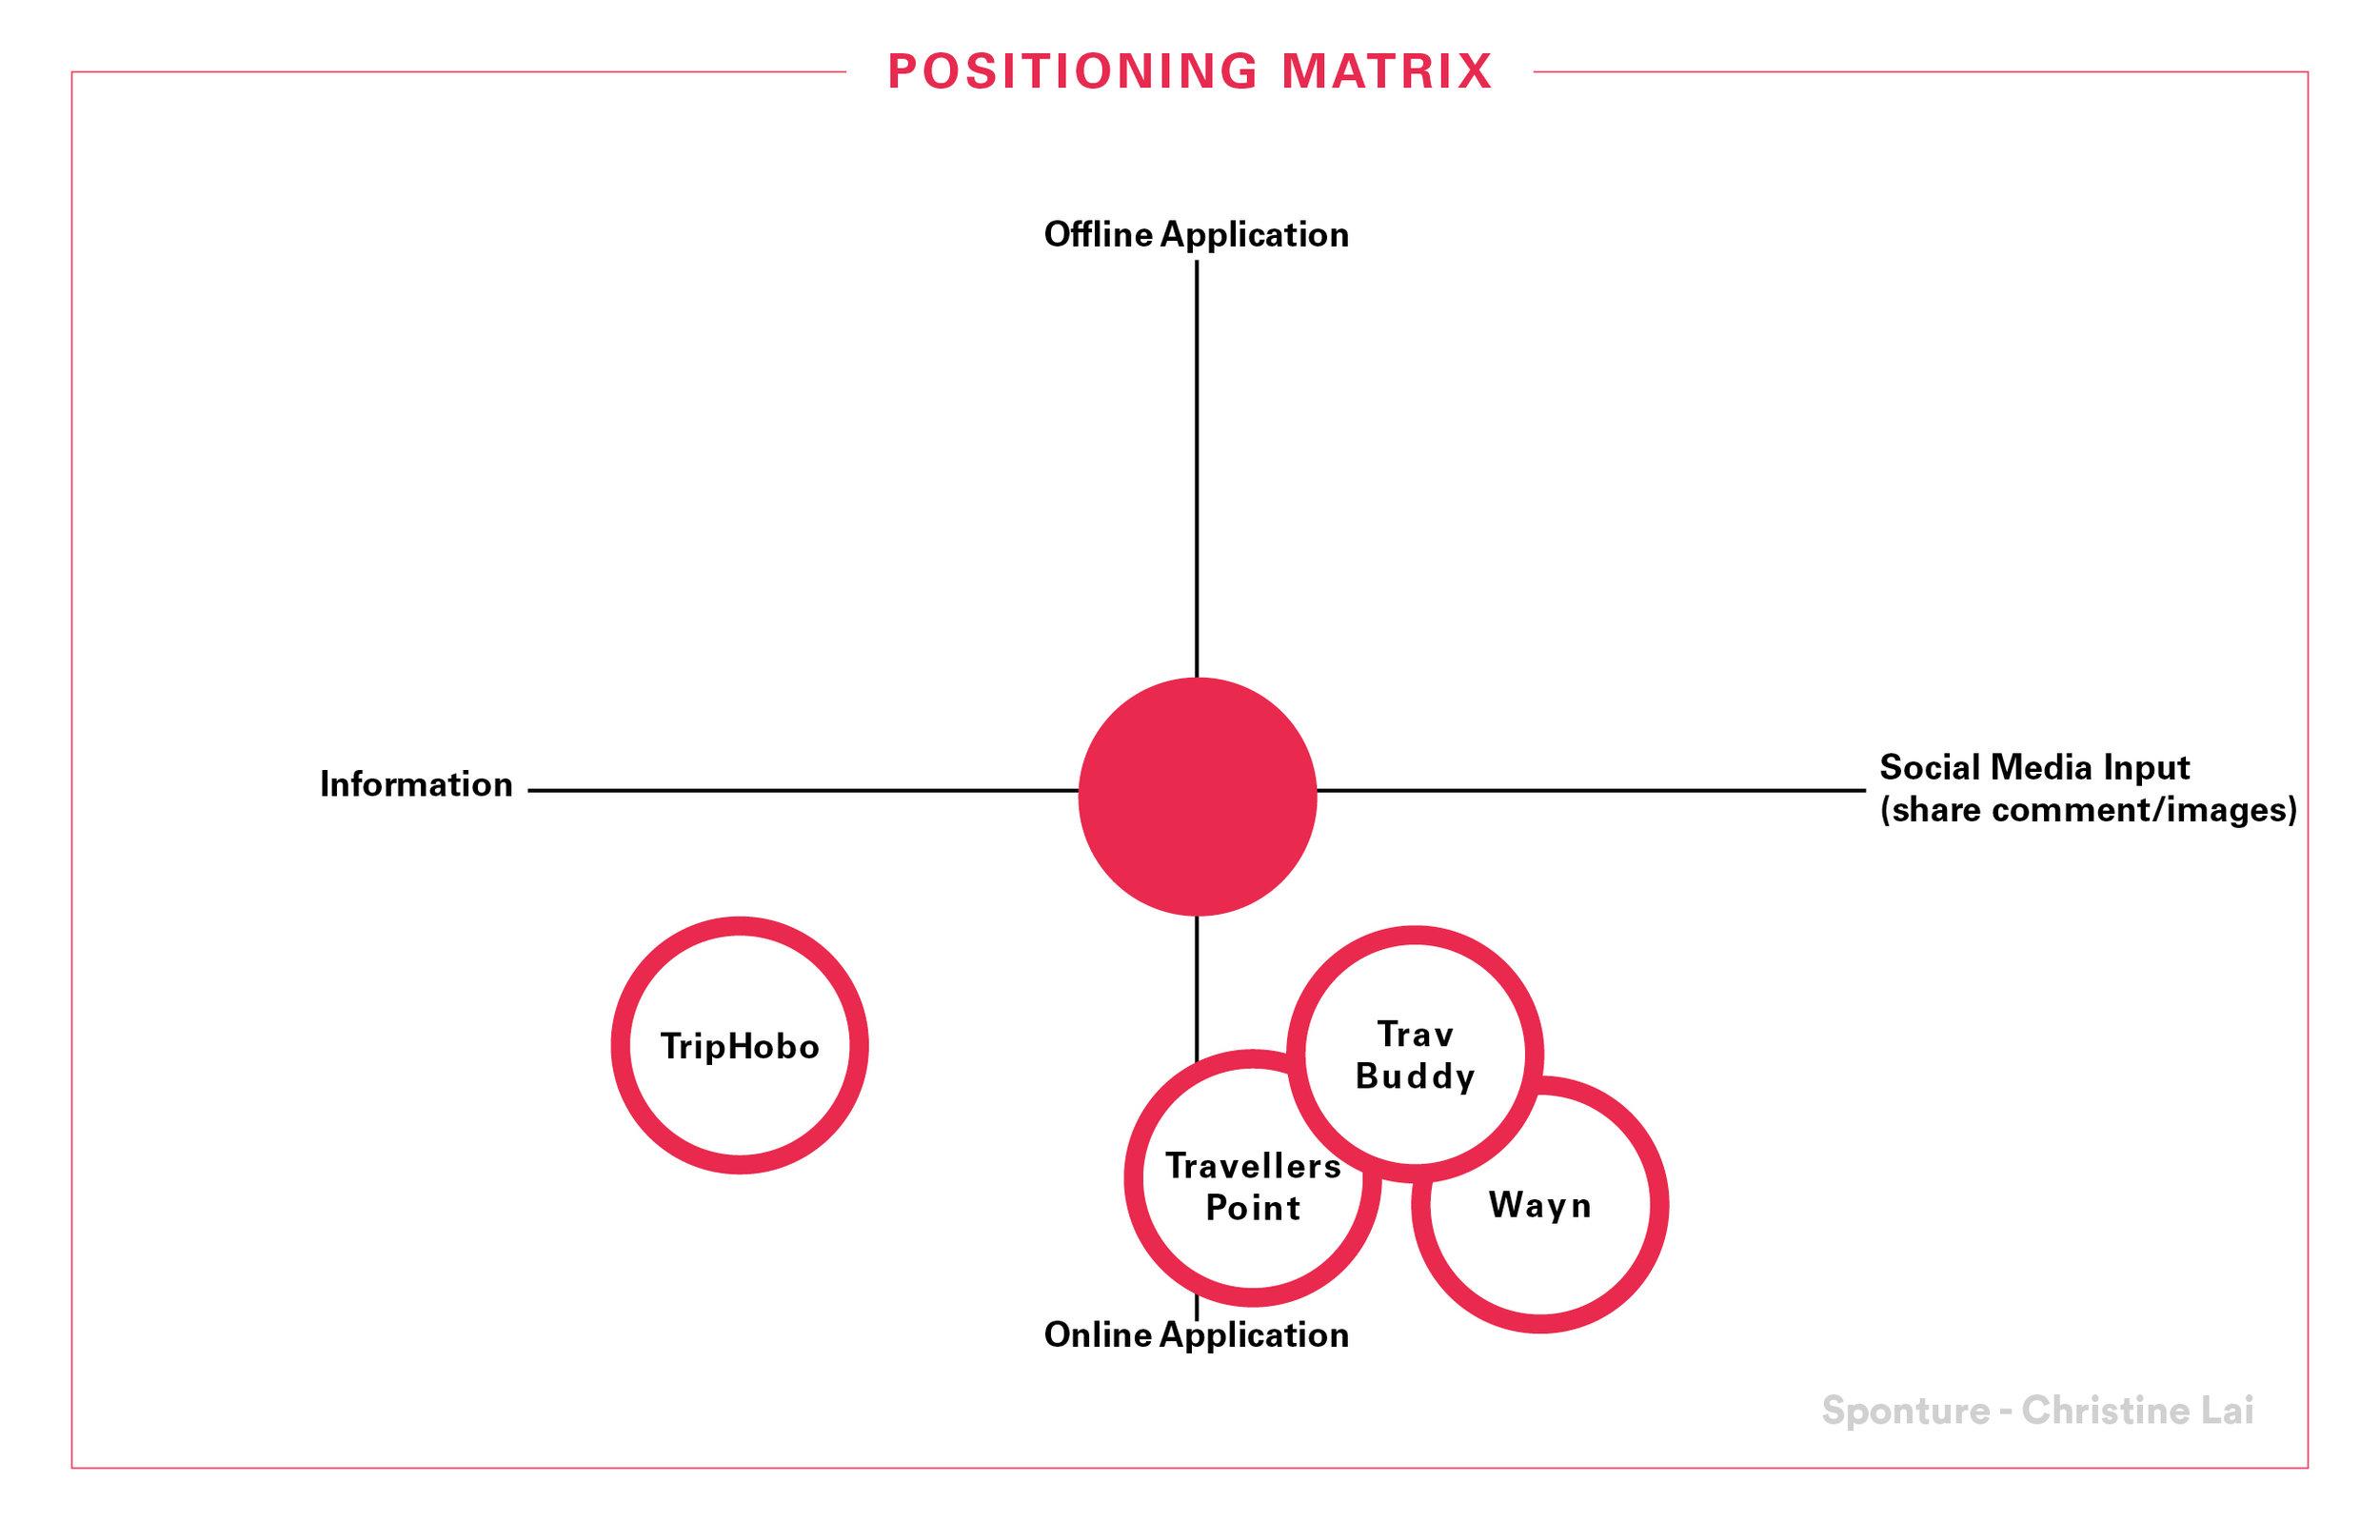 Sponture Matrix3.jpg